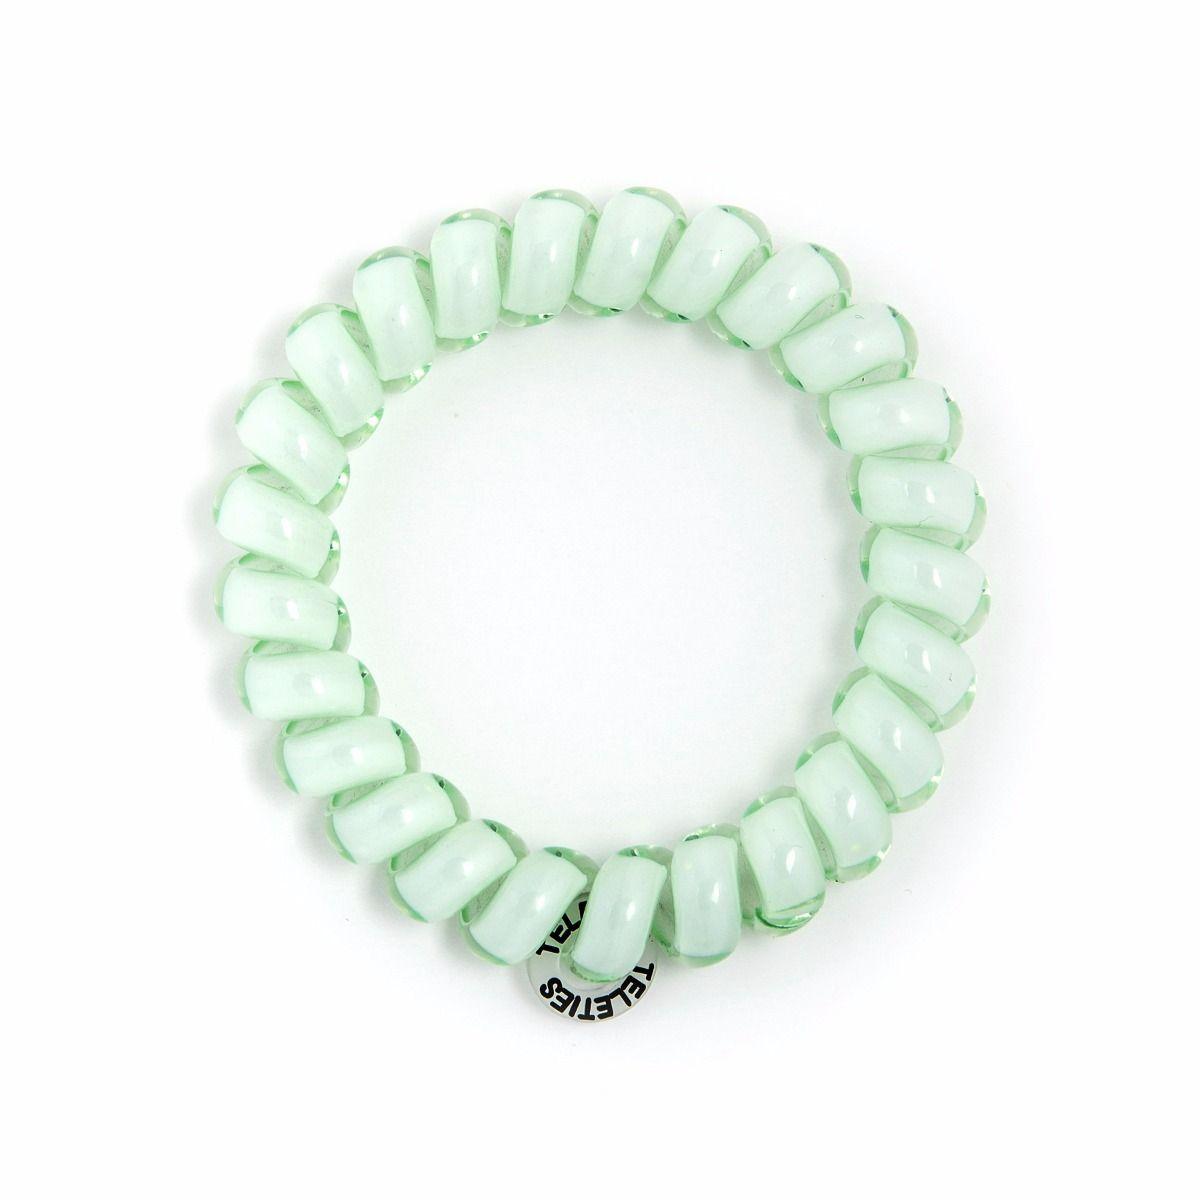 Teleties mint green hair band